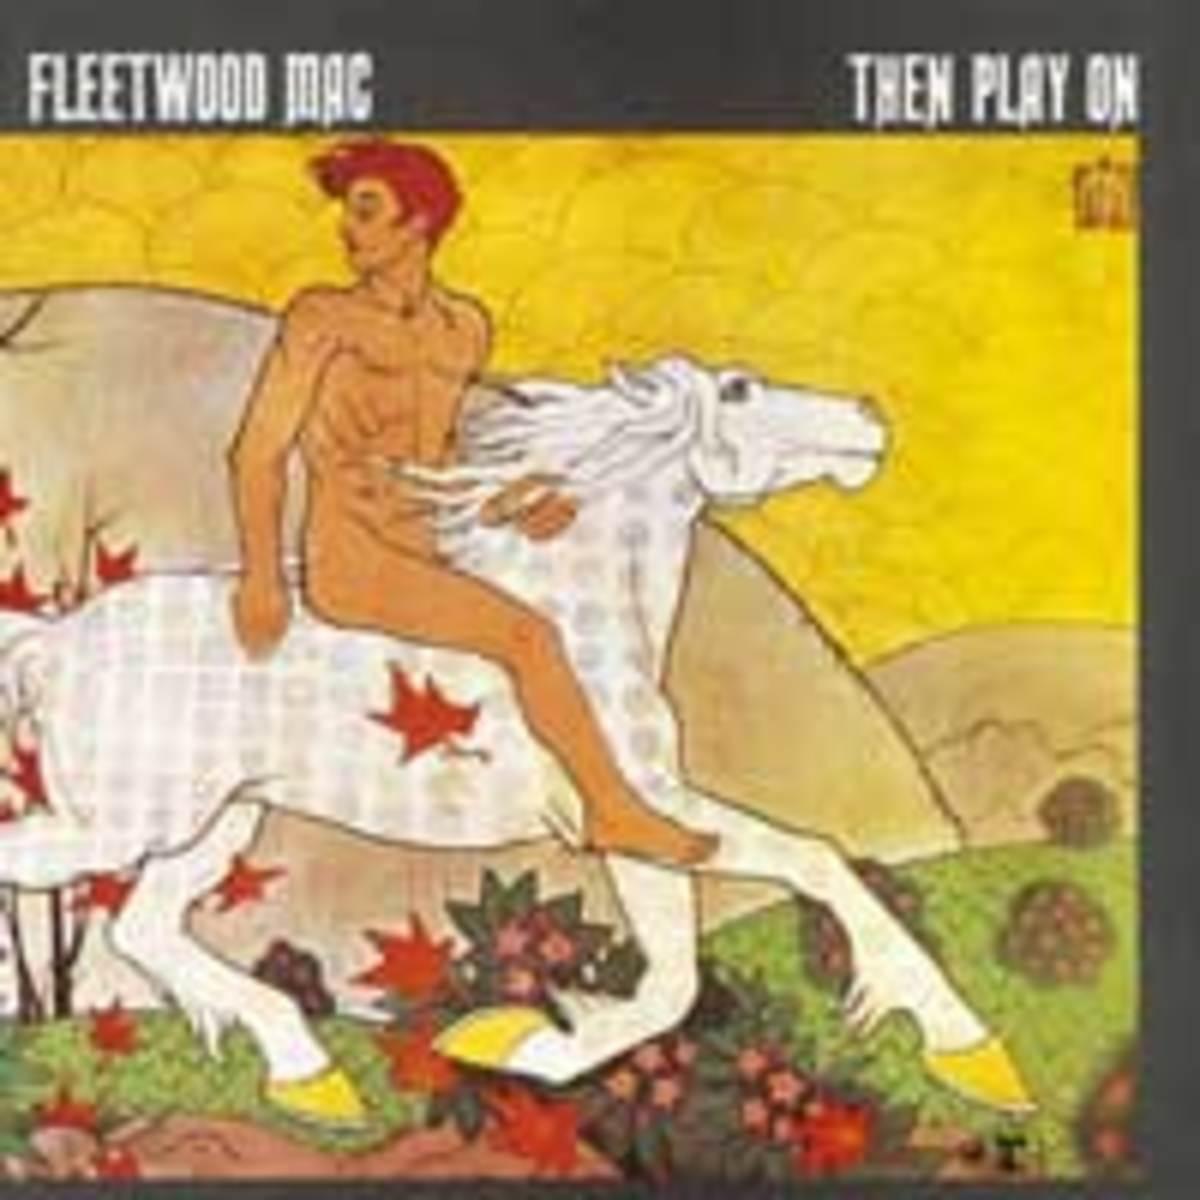 FleetwoodMac_ThenPlayOn